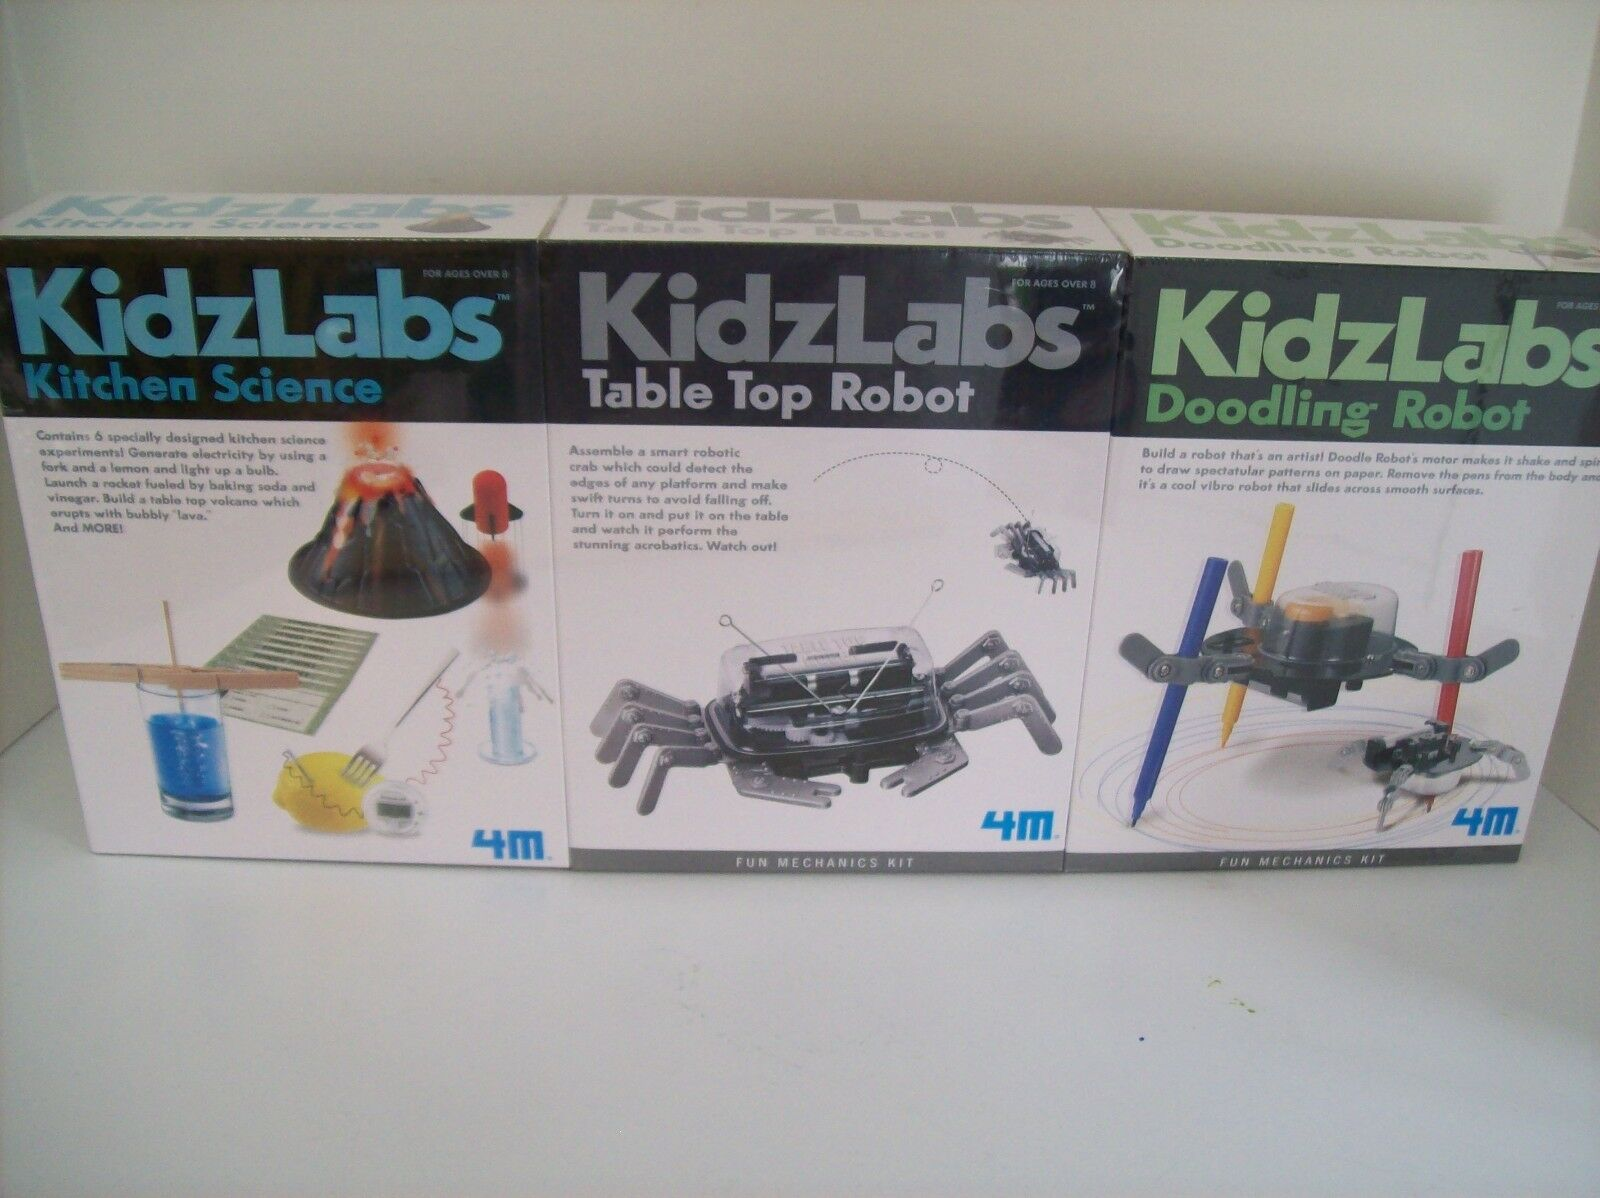 4M KidzLabs Science Kits -3 Kits (as shown) set - NEW Sealed